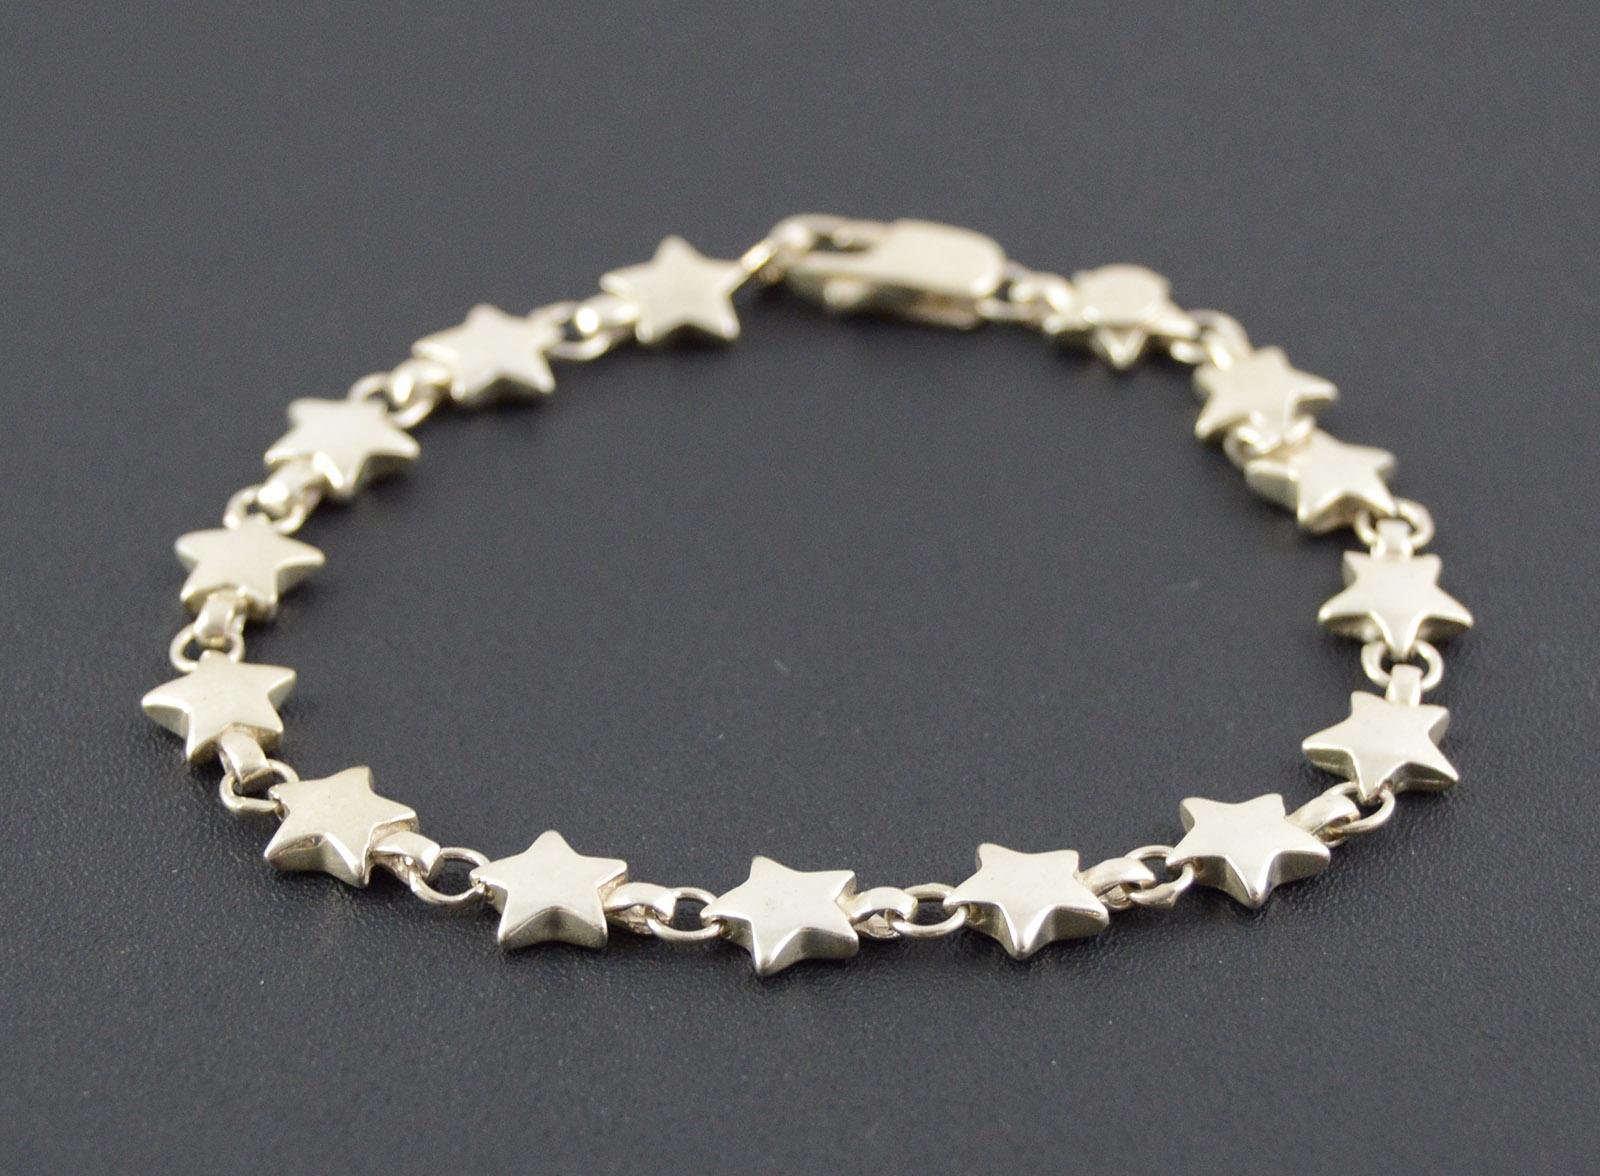 11 8g Solid Silver Tiffany Co Star Link Bracelet 7 25 Sterling Premium Marked 925